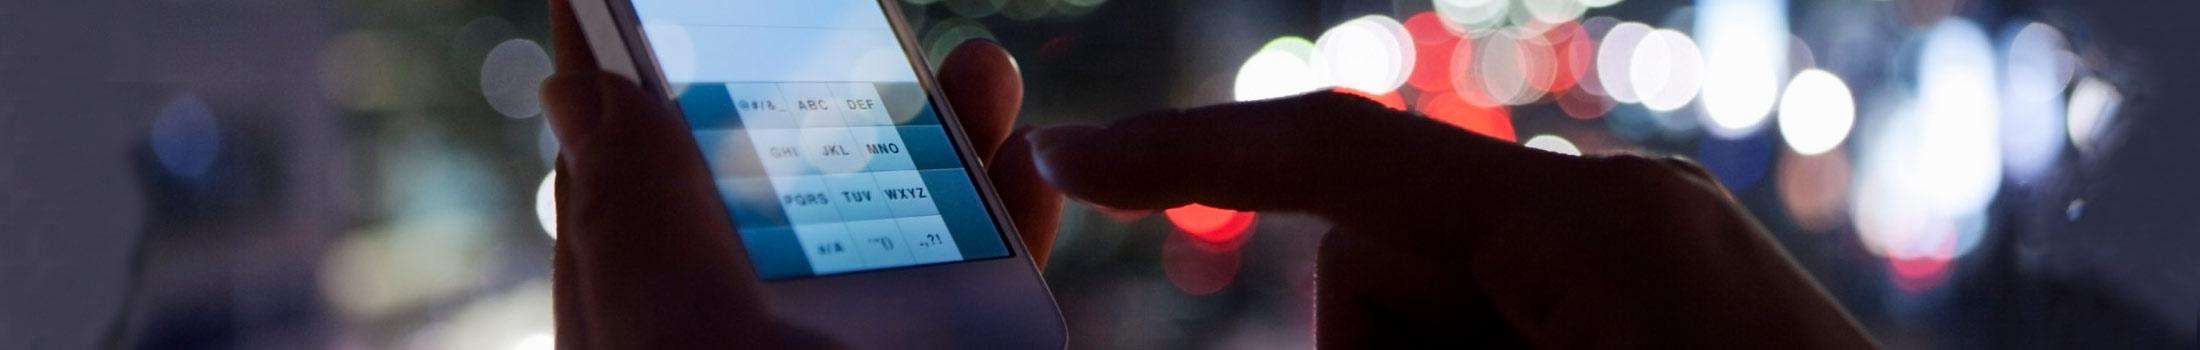 phone-nuit